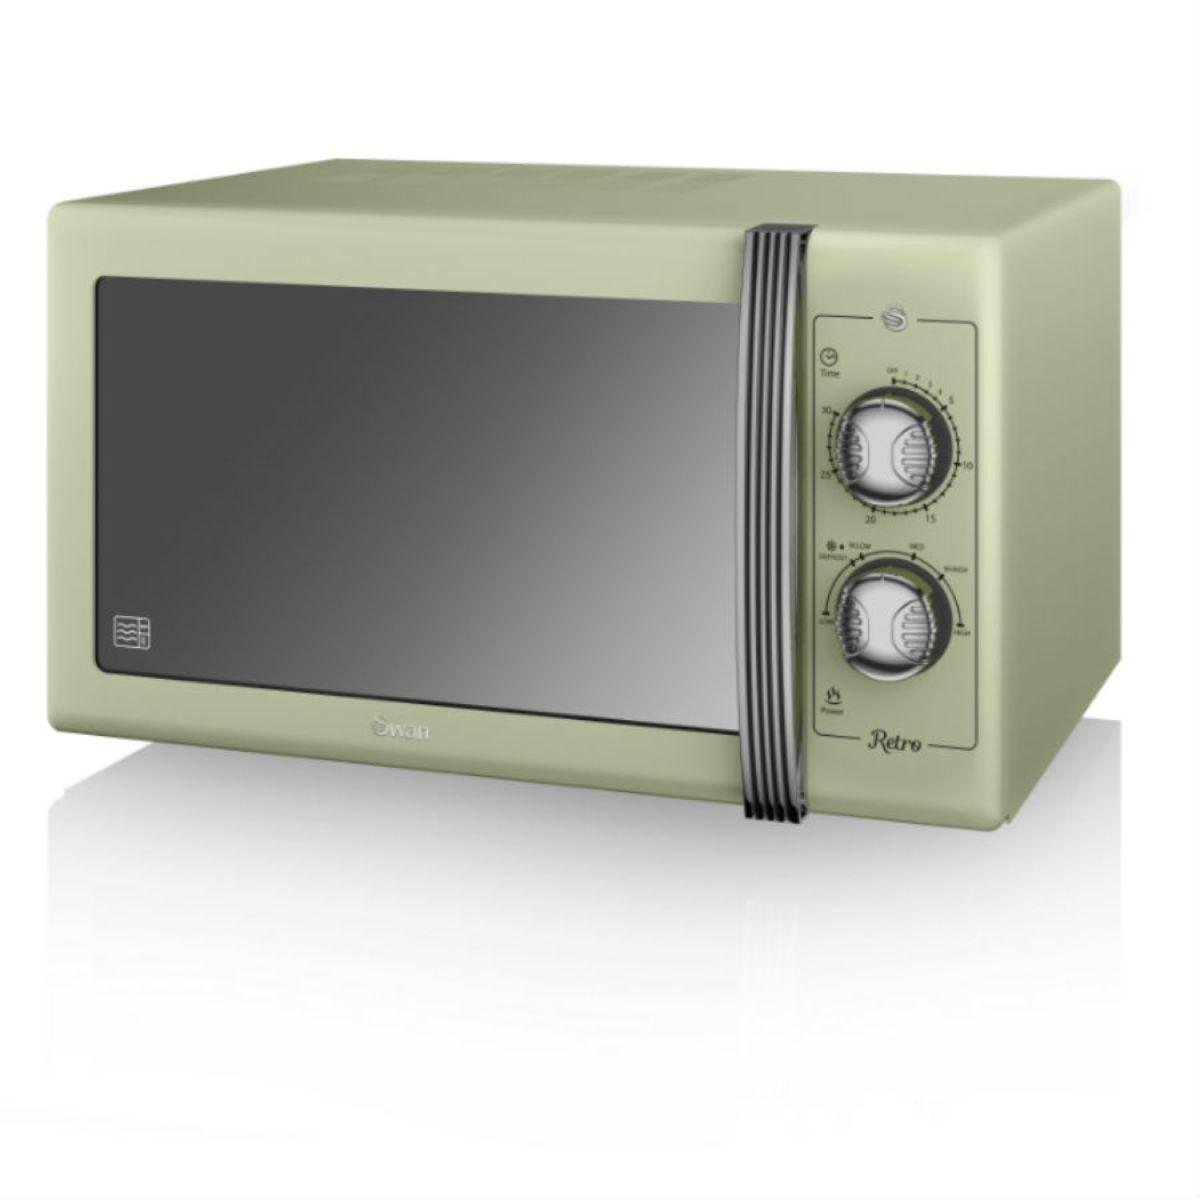 Swan Retro 900W 25L Manual Solo Microwave - Green